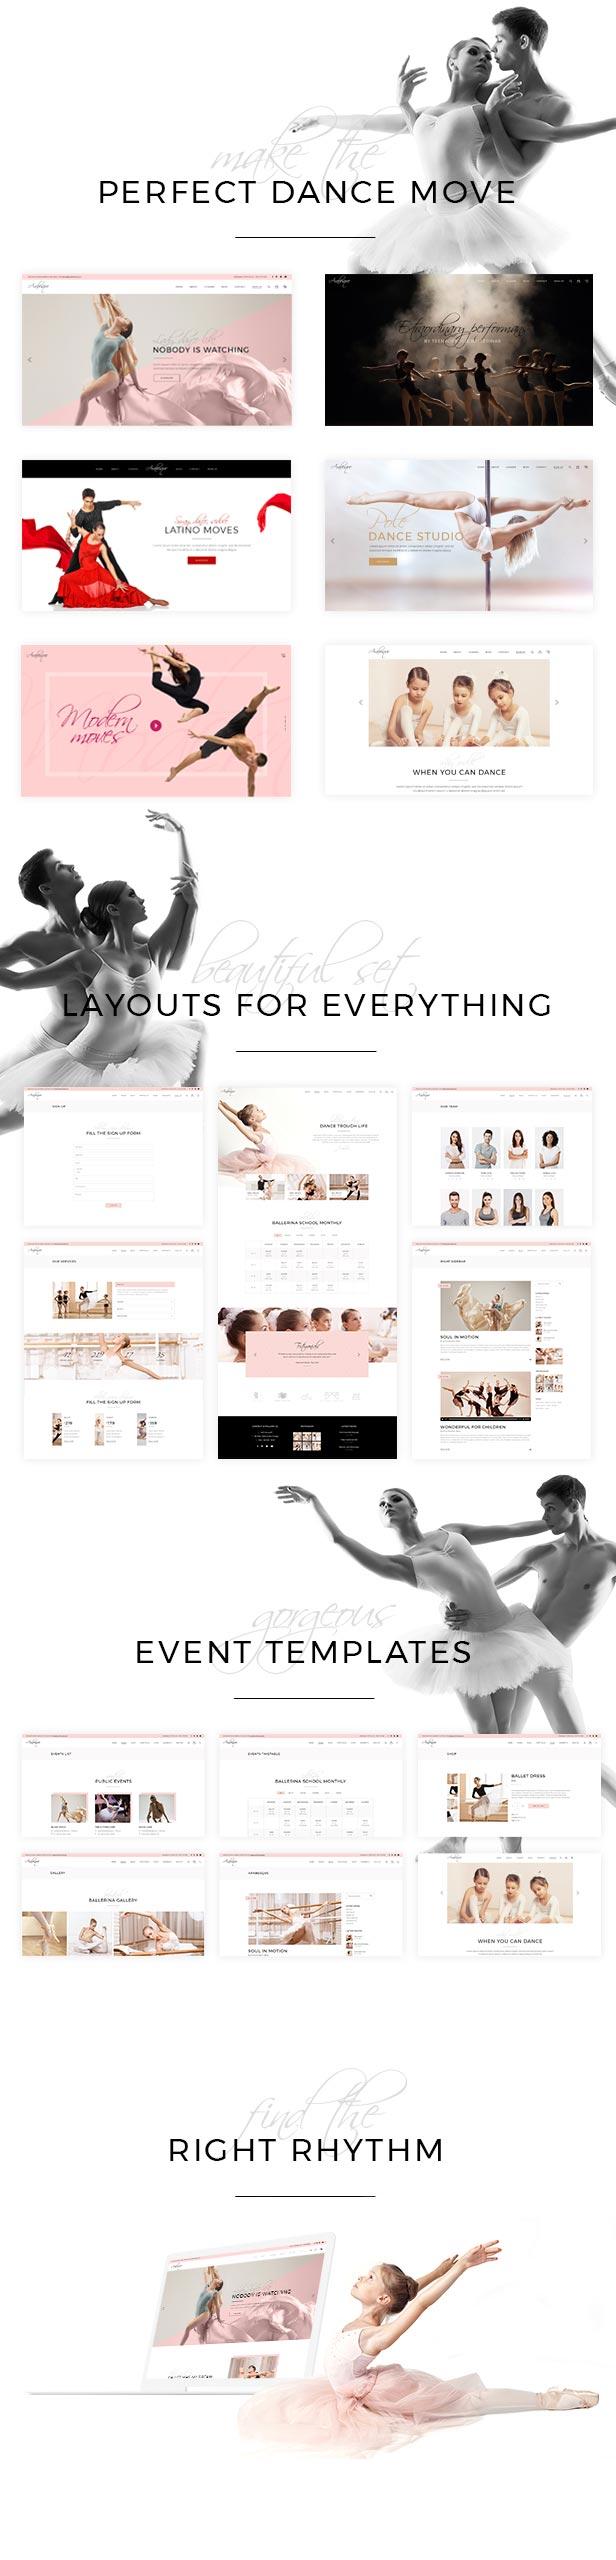 Arabesque - Modern Ballet School and Dance Studio Theme - 1